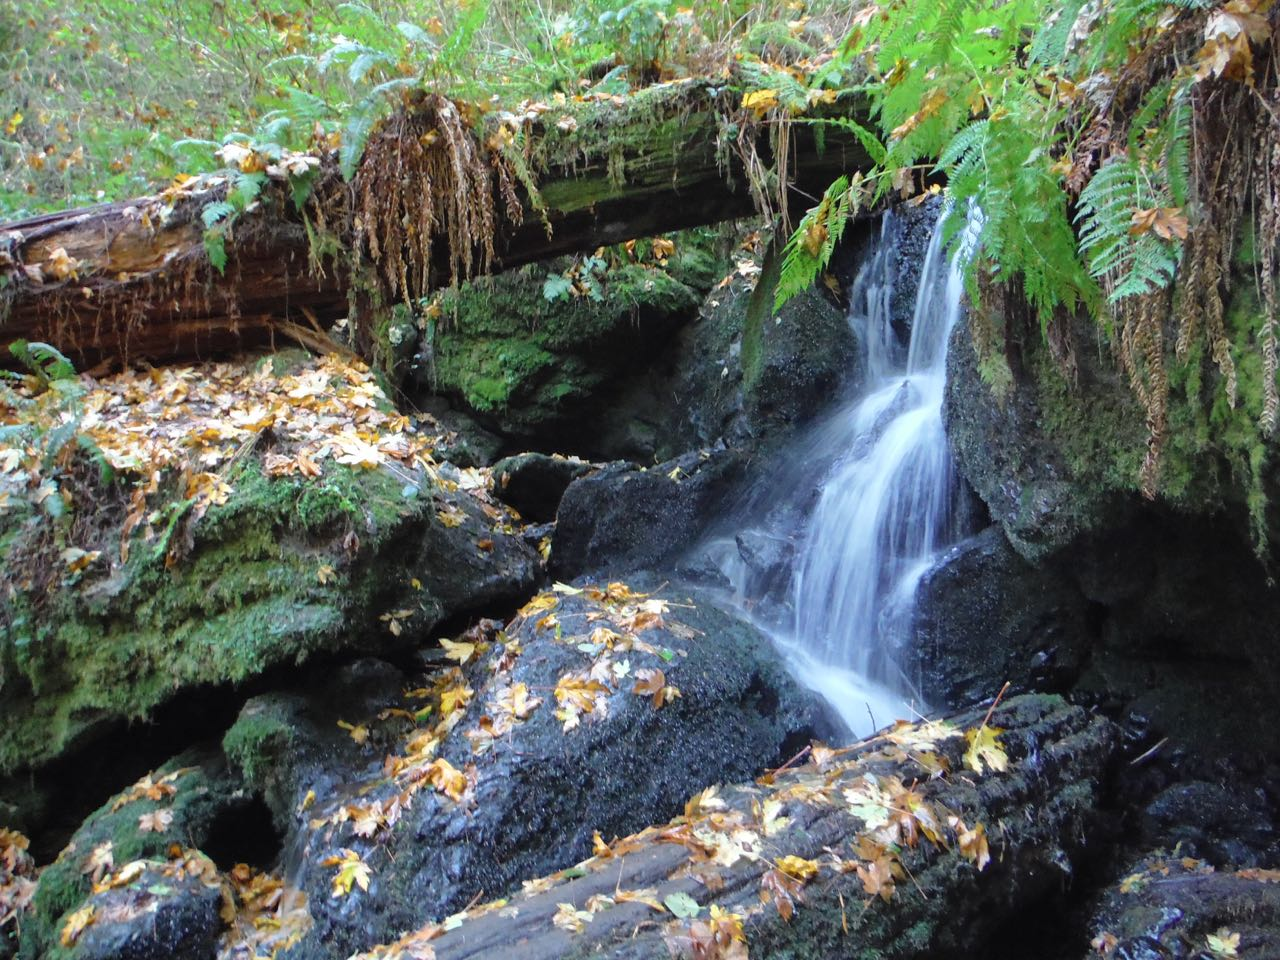 Redwoods 2017 10 08 232 Of 287